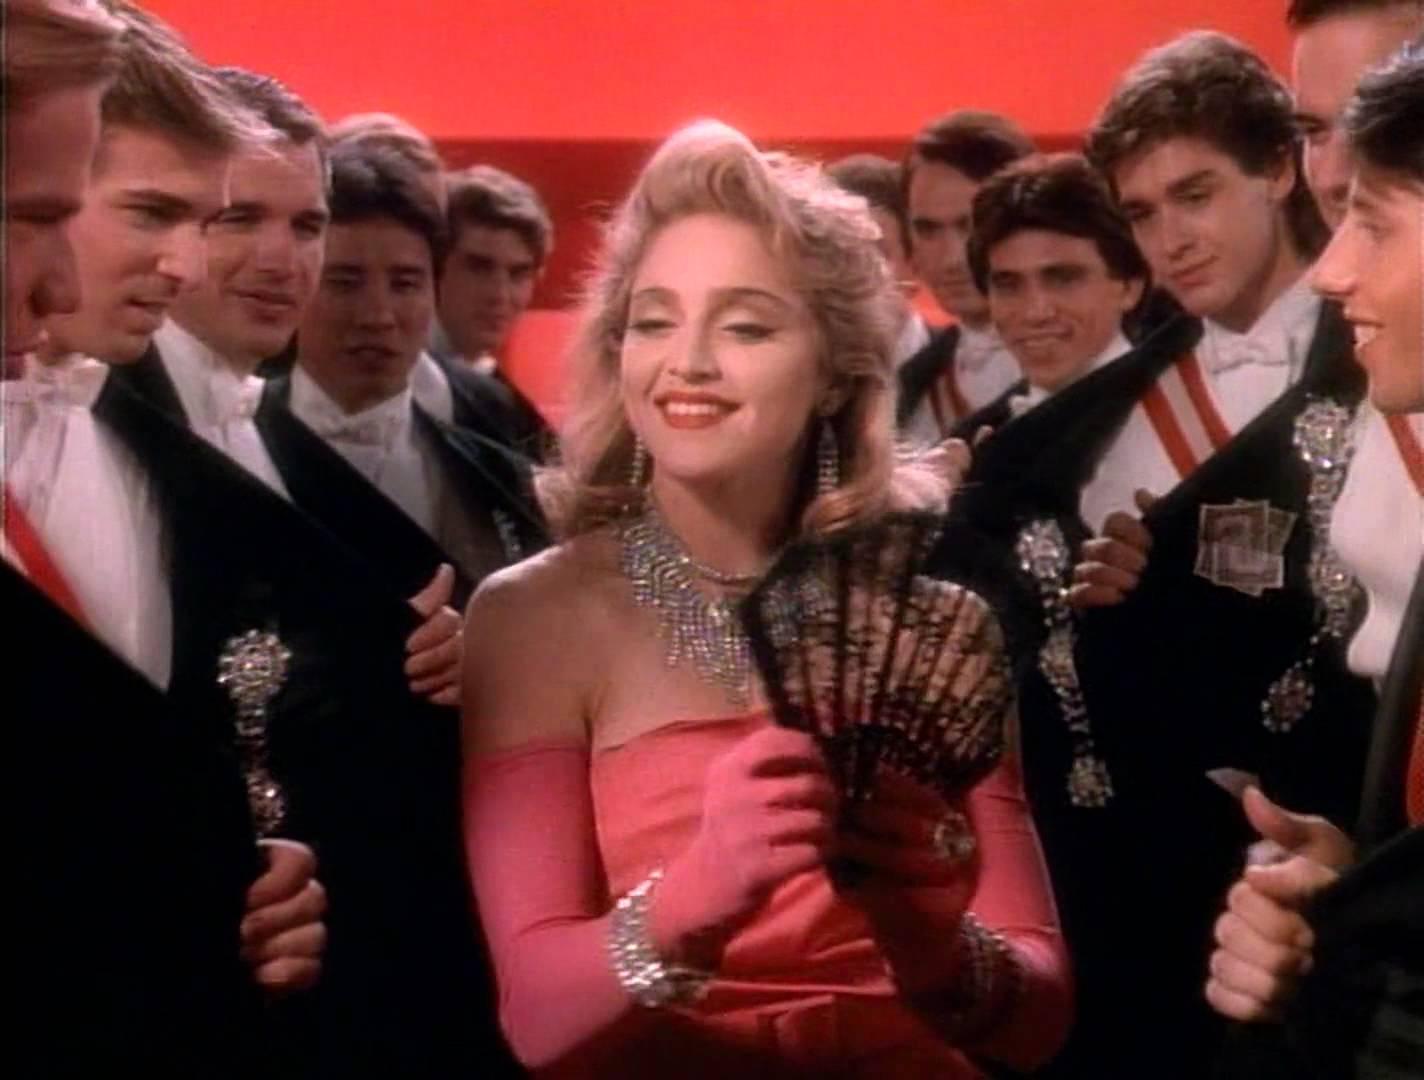 آهنگ Material Girl از Madonna